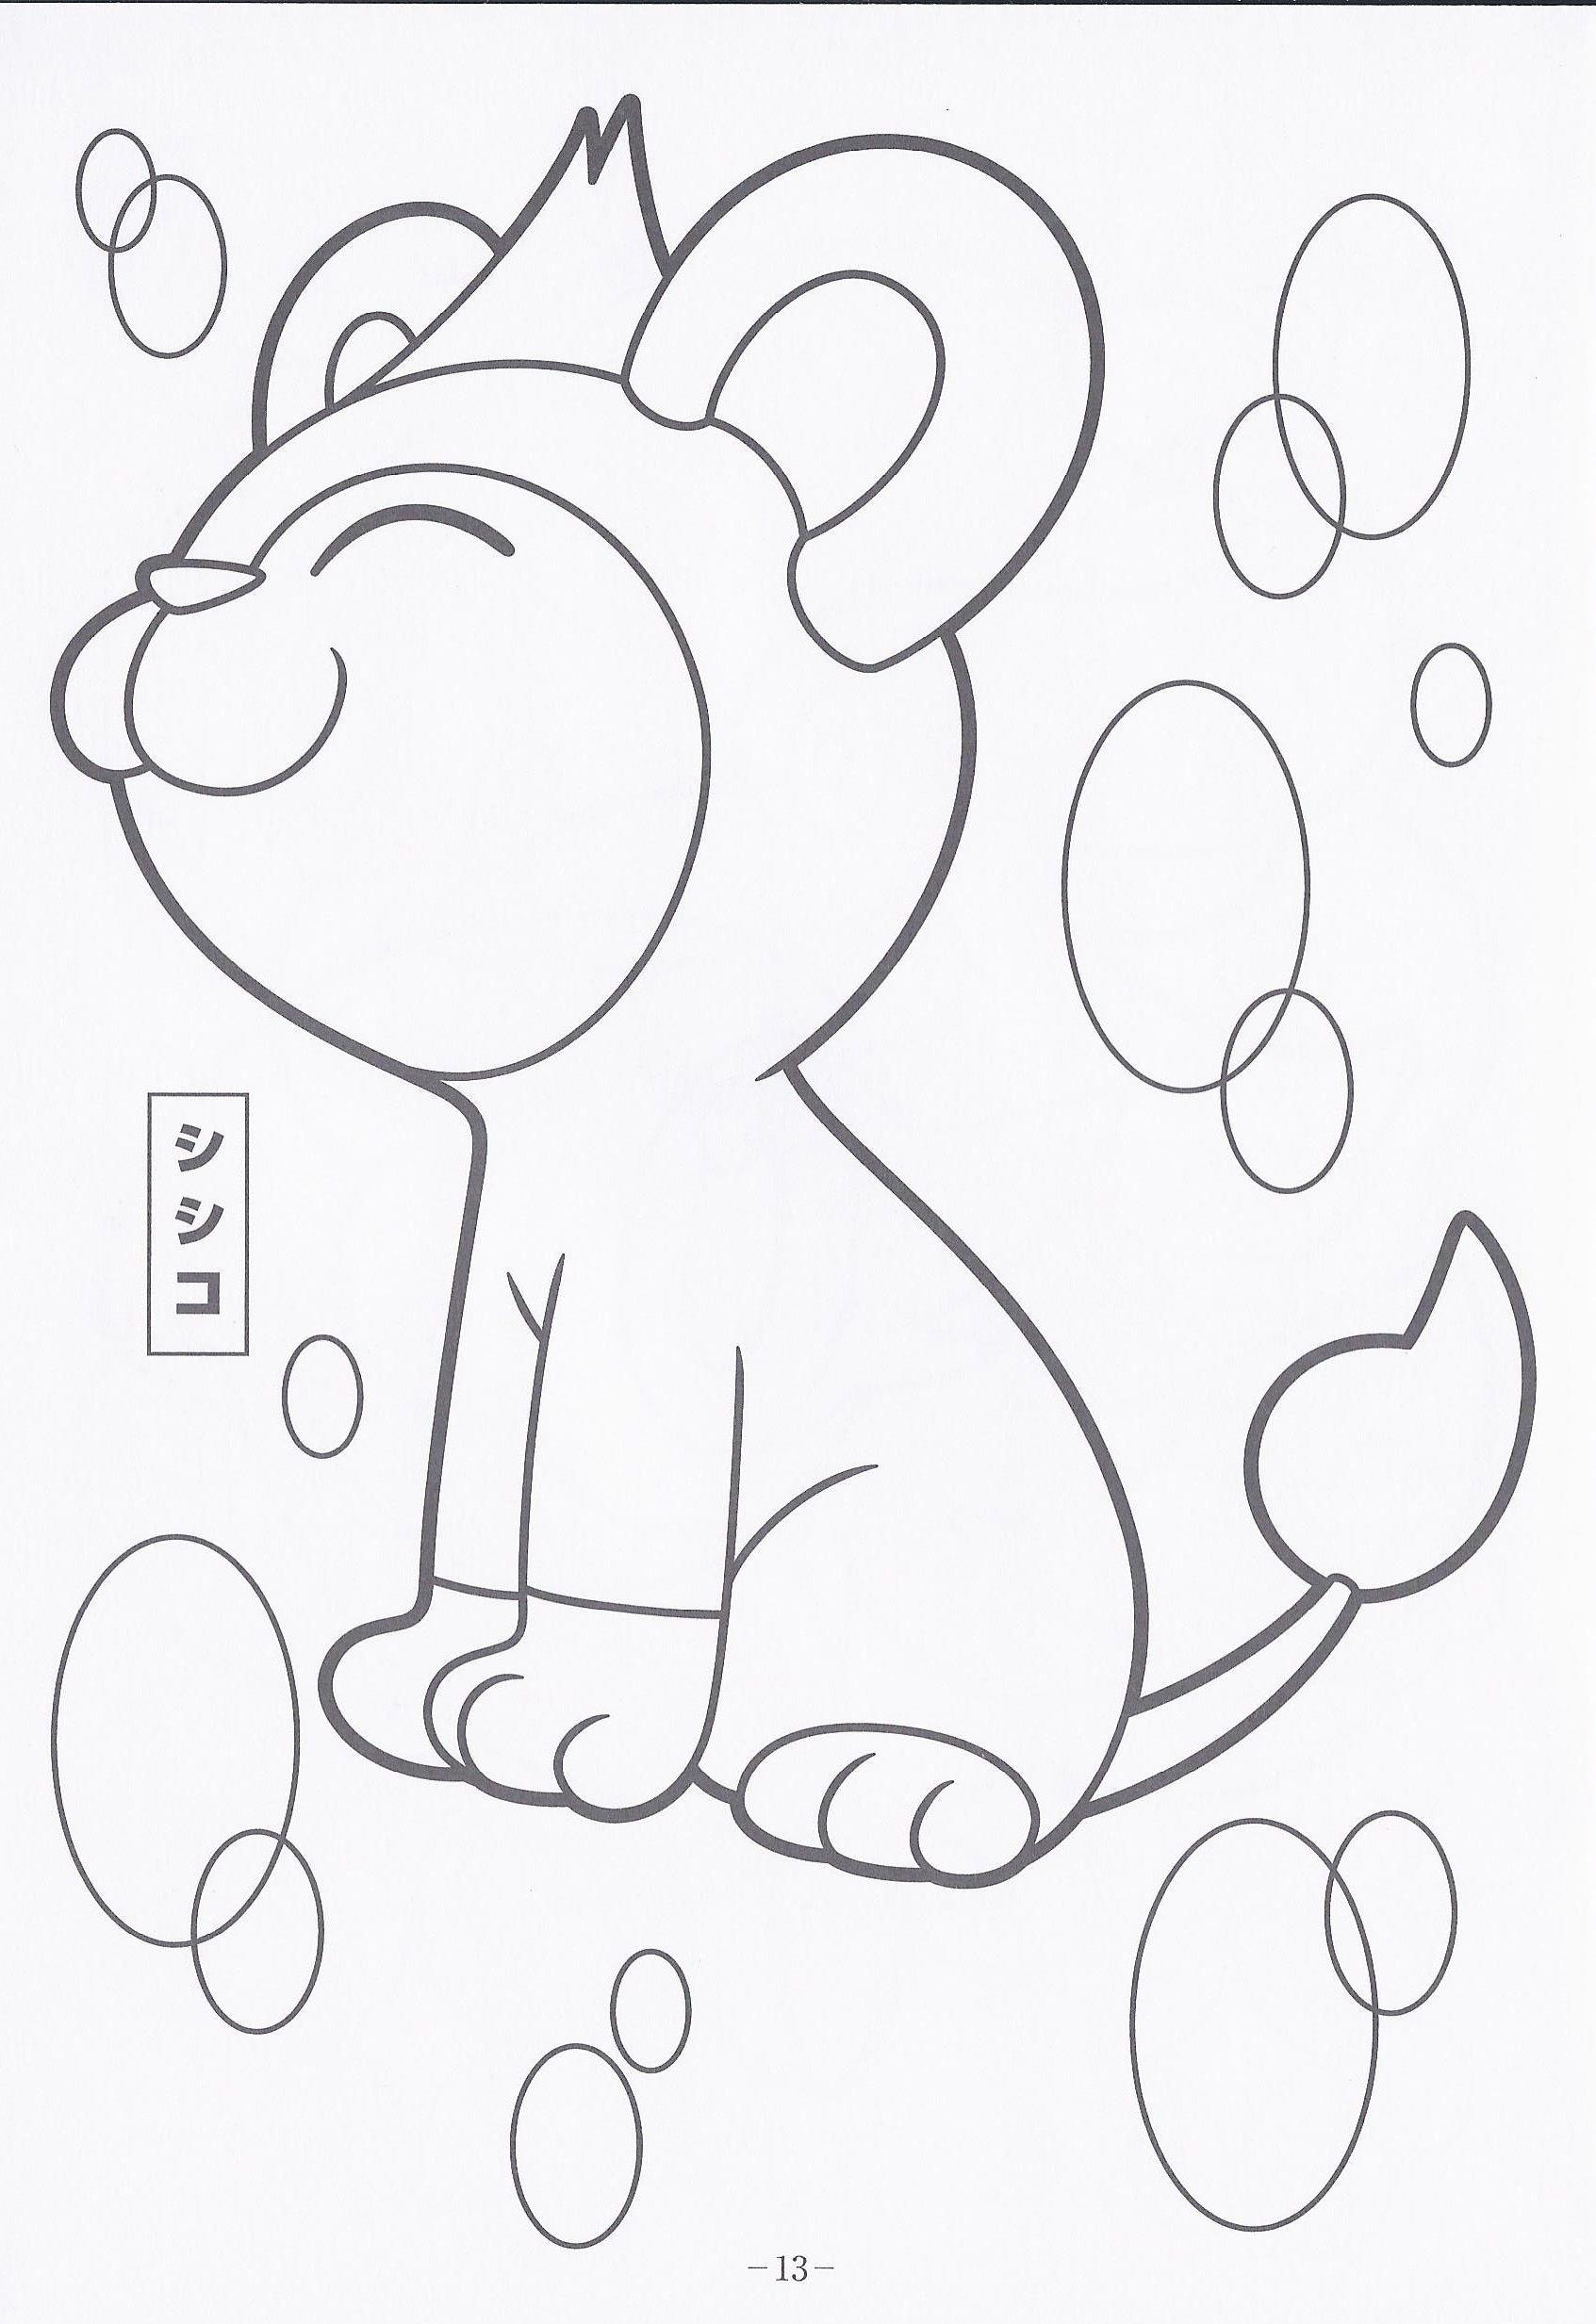 Name: Shishiko | Pokemon XY coloring | Pokemon coloring ...